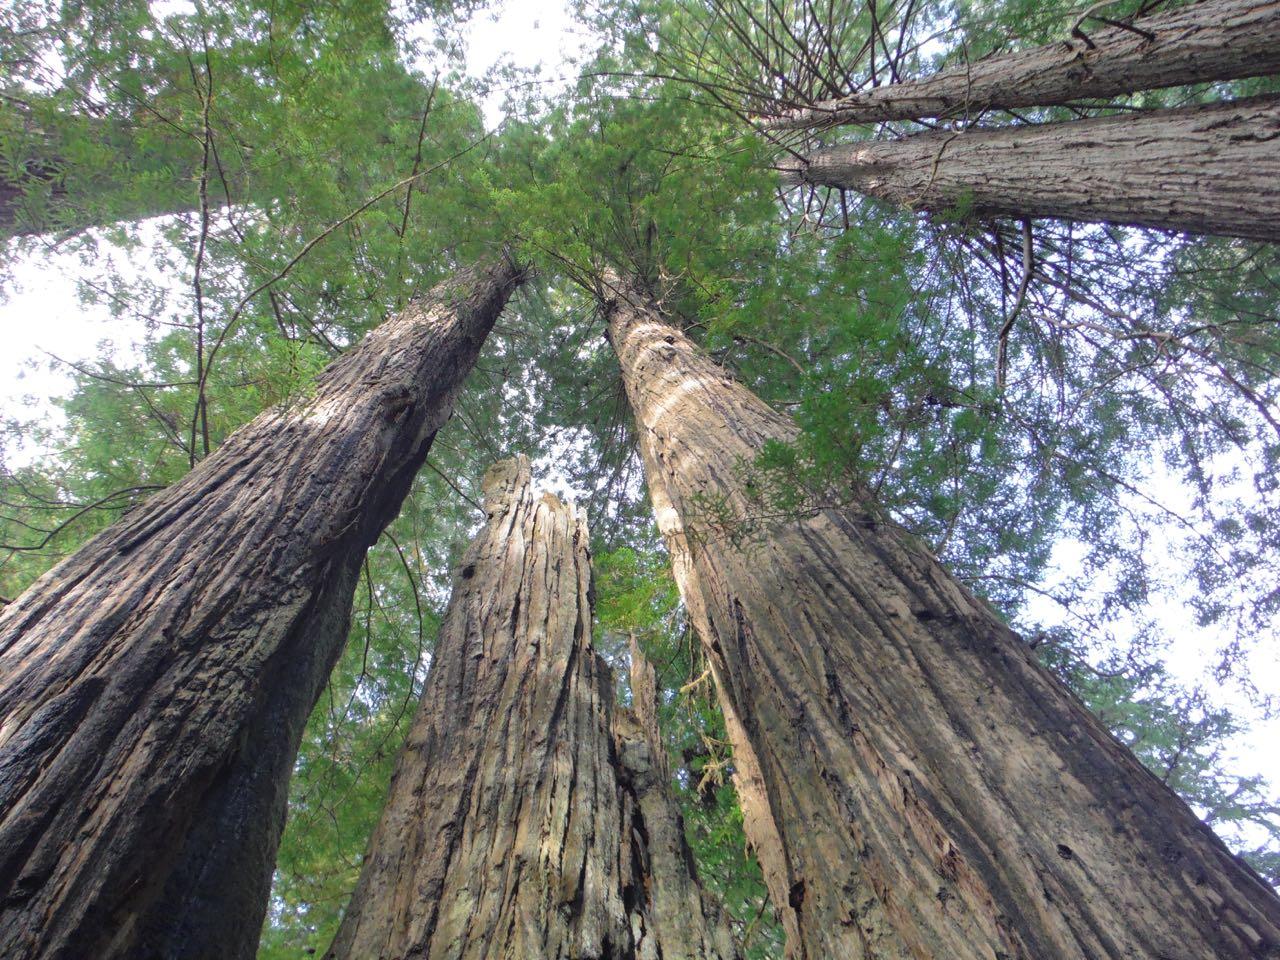 Redwoods 2017 10 08 272 Of 287